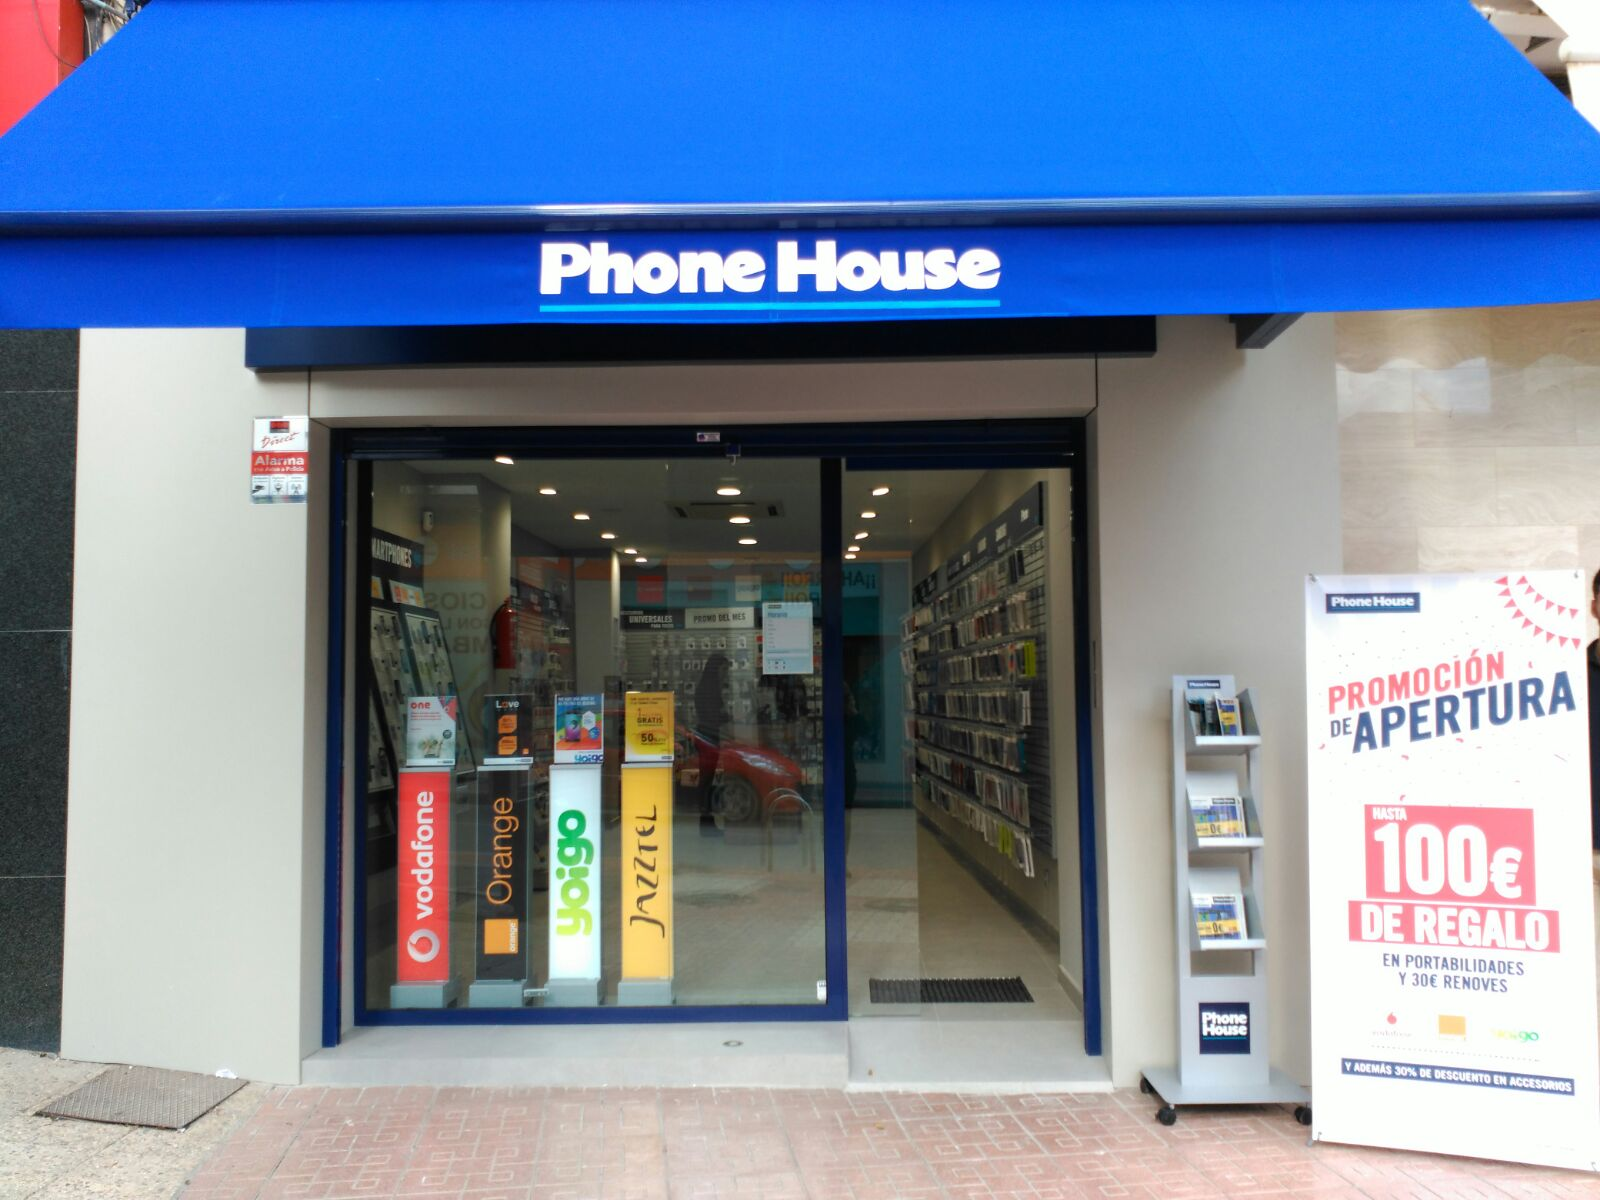 Tienda Phone House Torre-Pacheco.Murcia